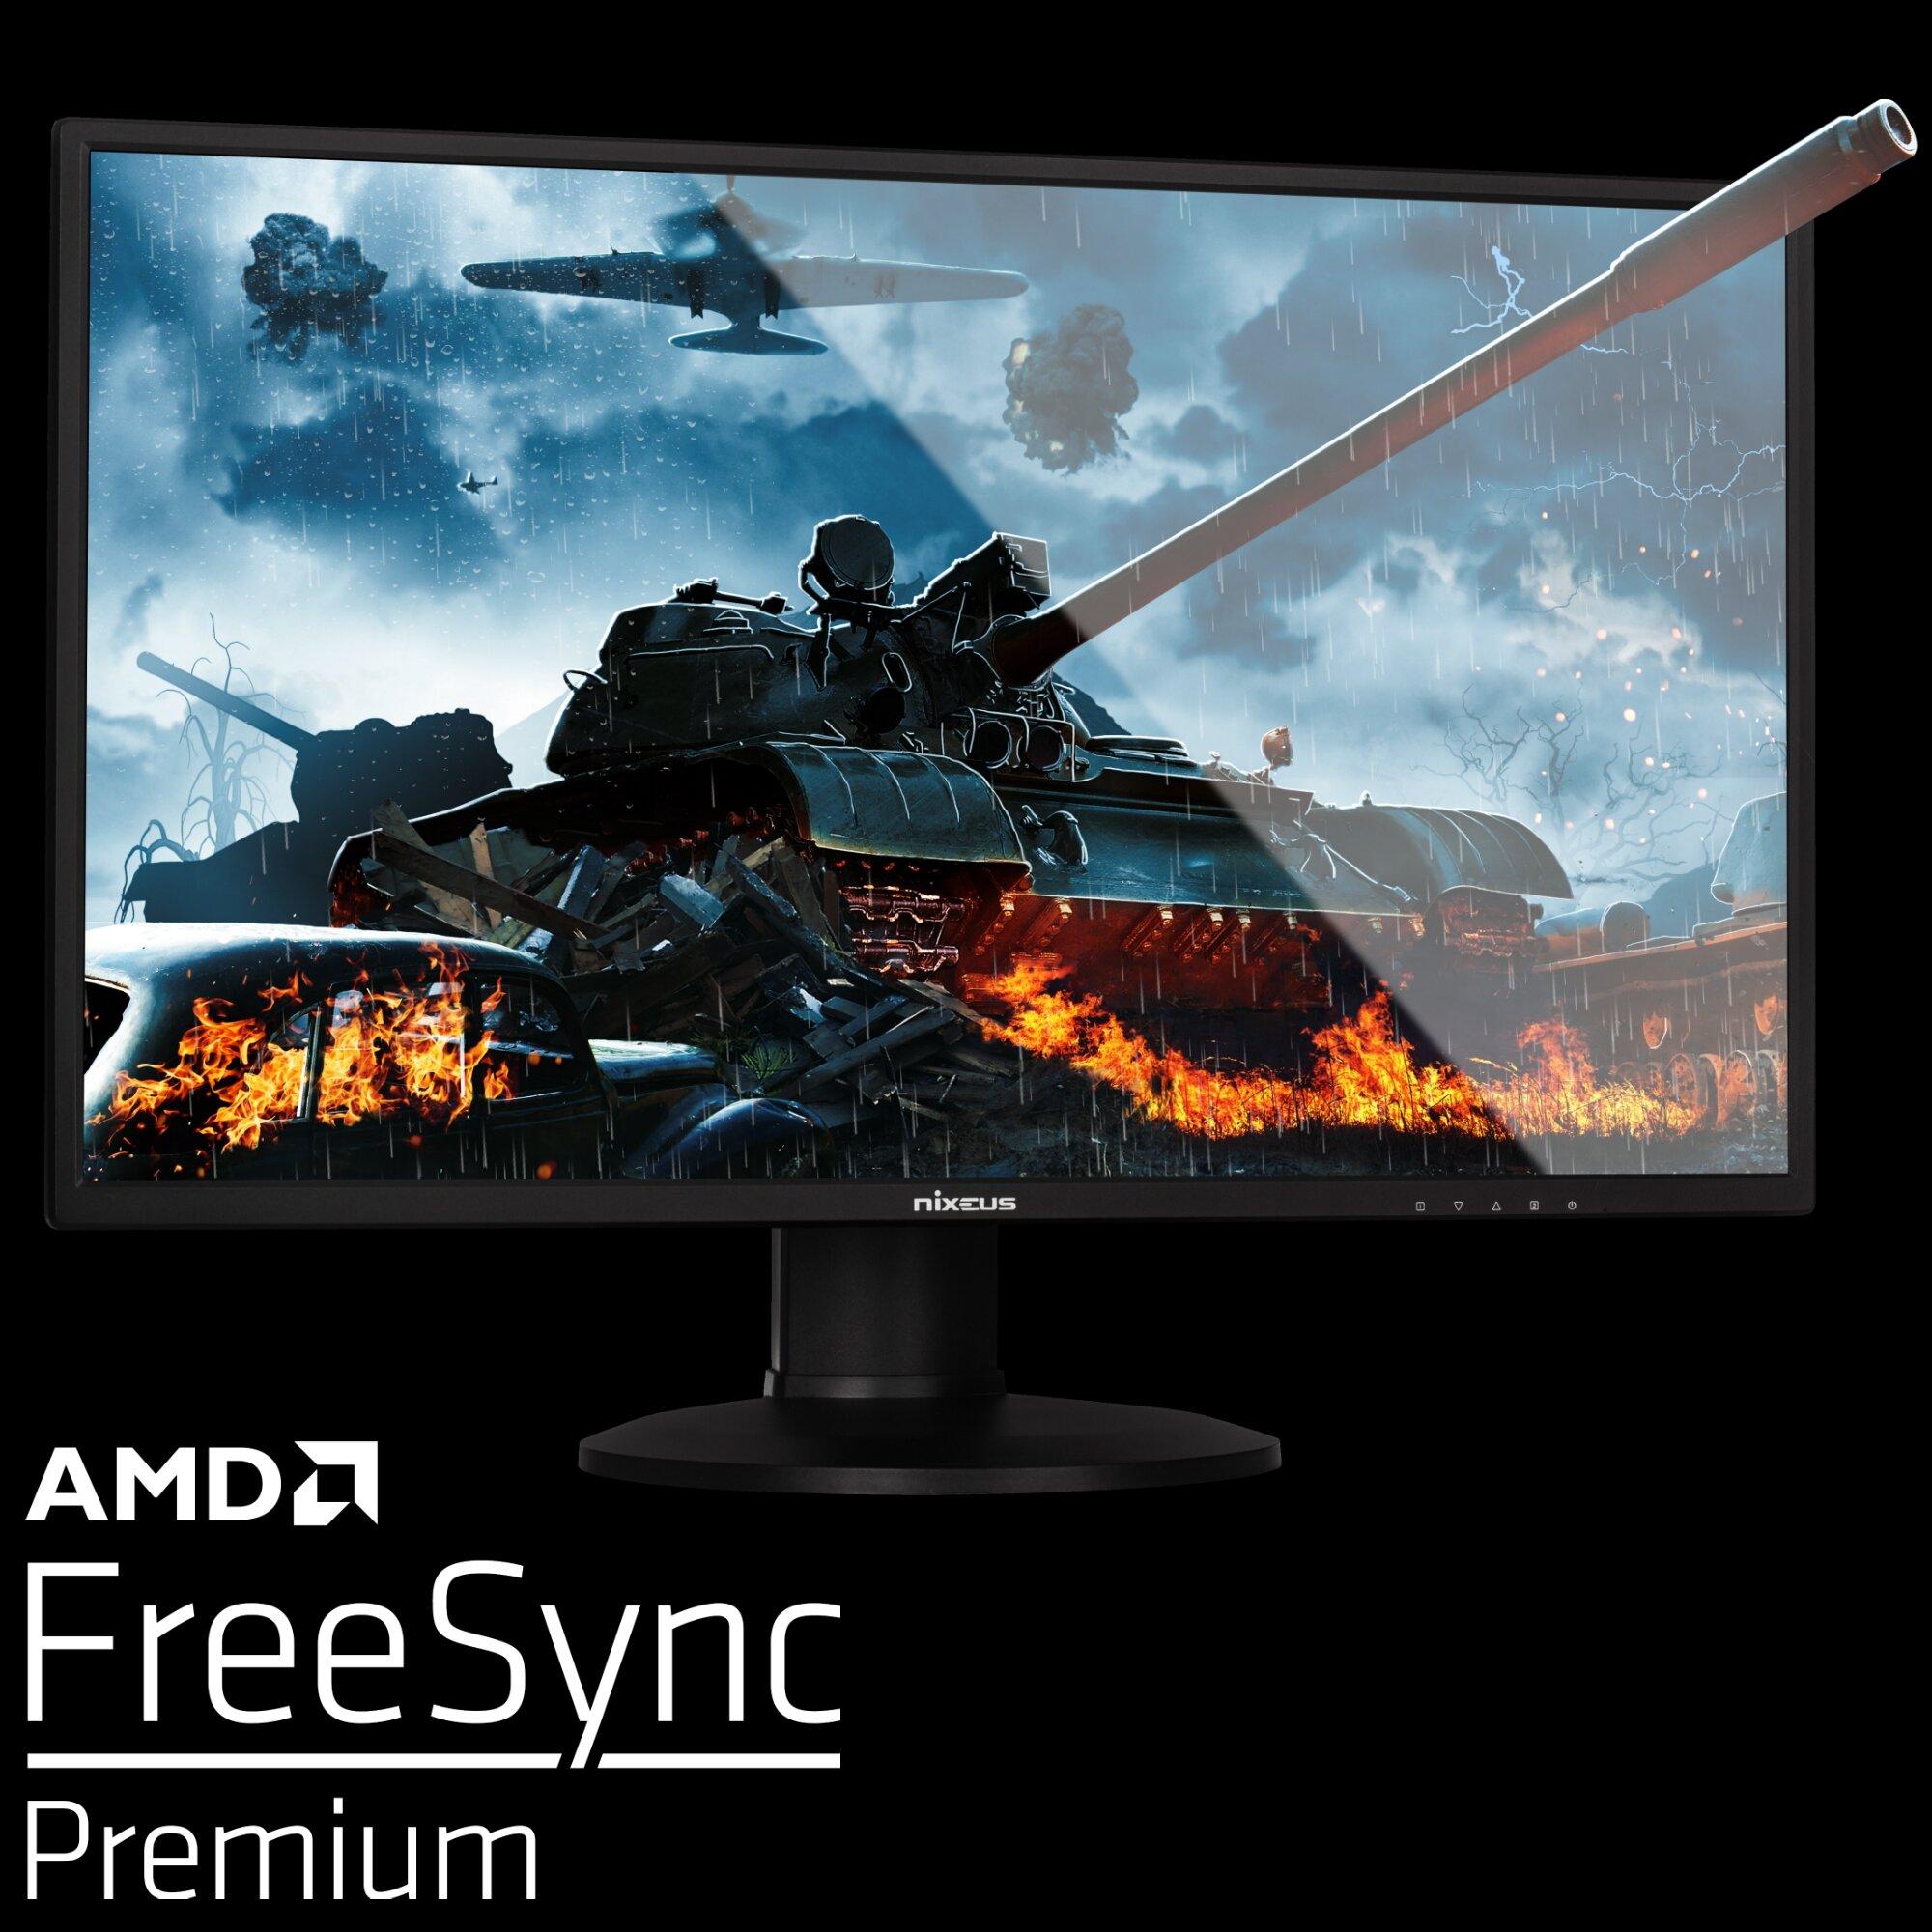 Nixeus Edg 27 Ips 2560 X 1440 Amd Freesync Premium Certified 144hz Gaming Monitor V2 Nixeus